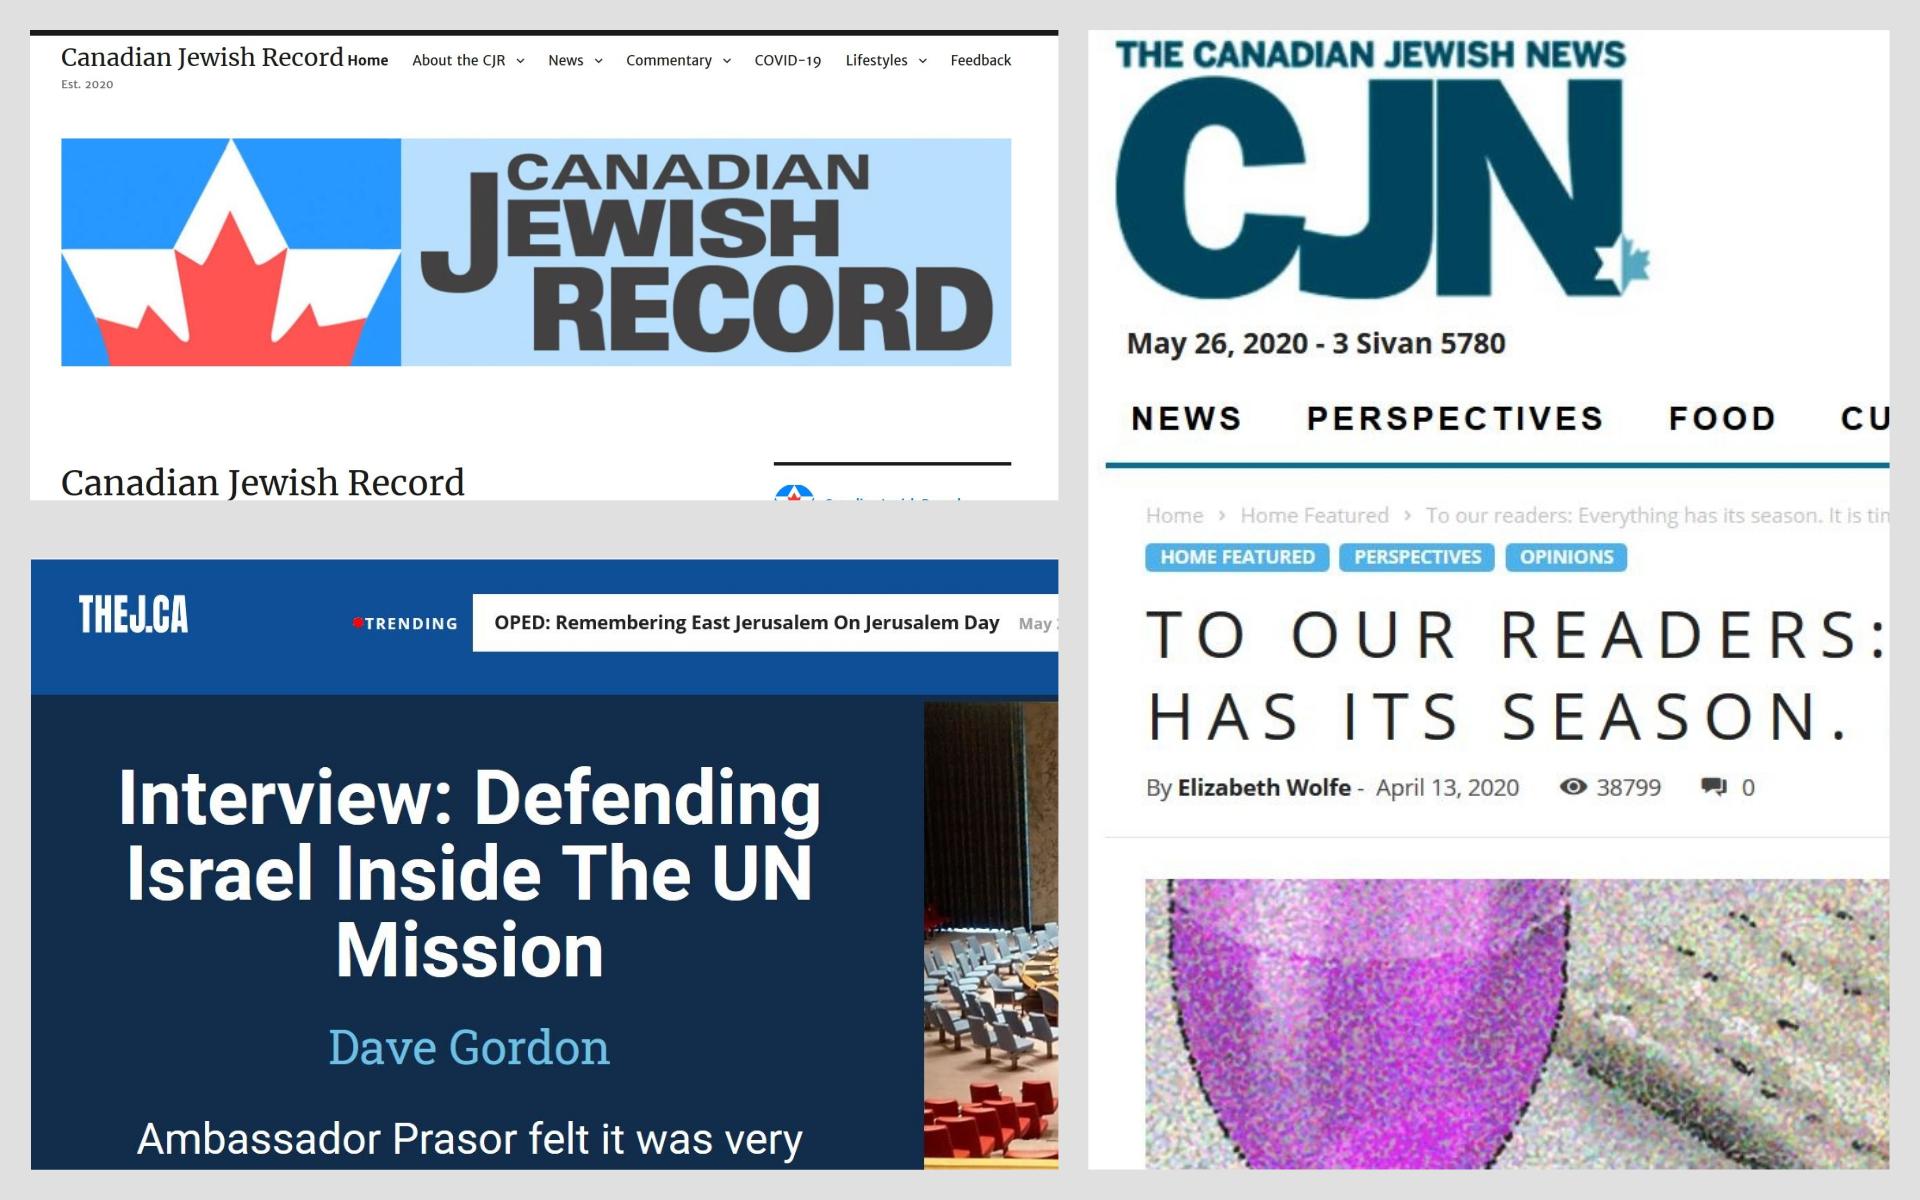 De gauche à droite : captures écran du  Canadian Jewish Record, The Canadian Jewish News, and TheJ.ca.